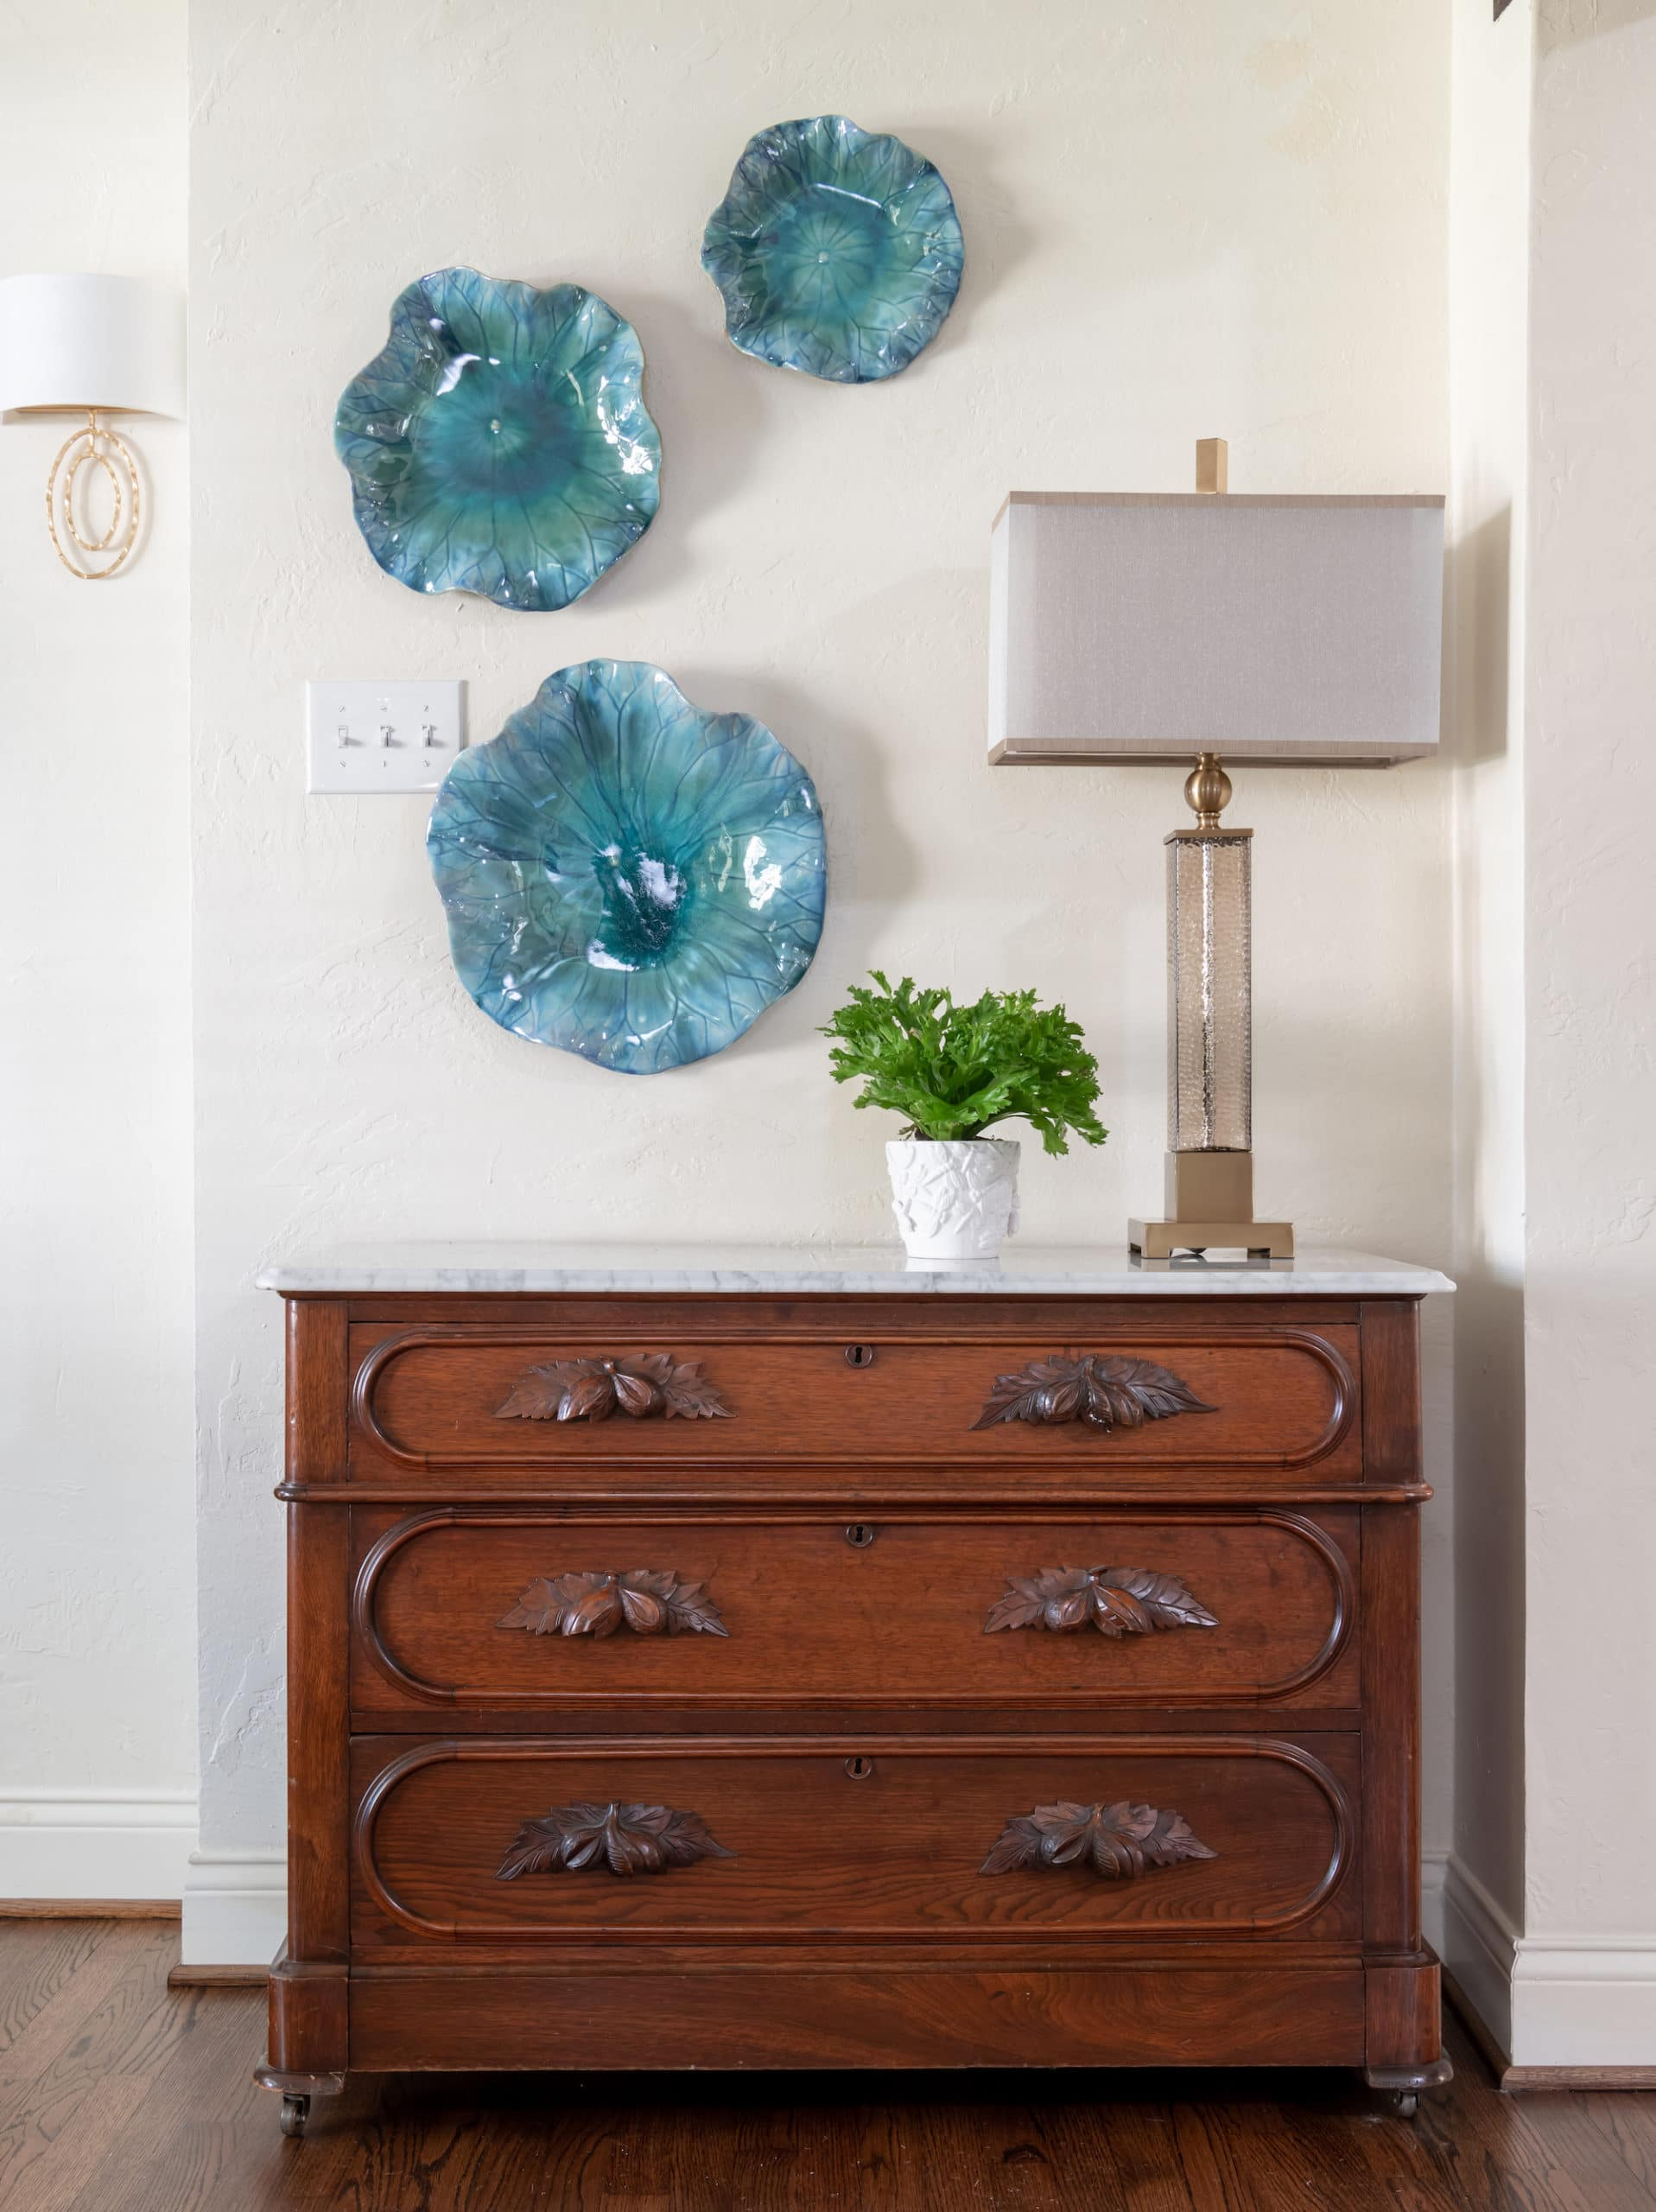 furniture finisher, dallas tx, interior designer near me, del webb texas communities